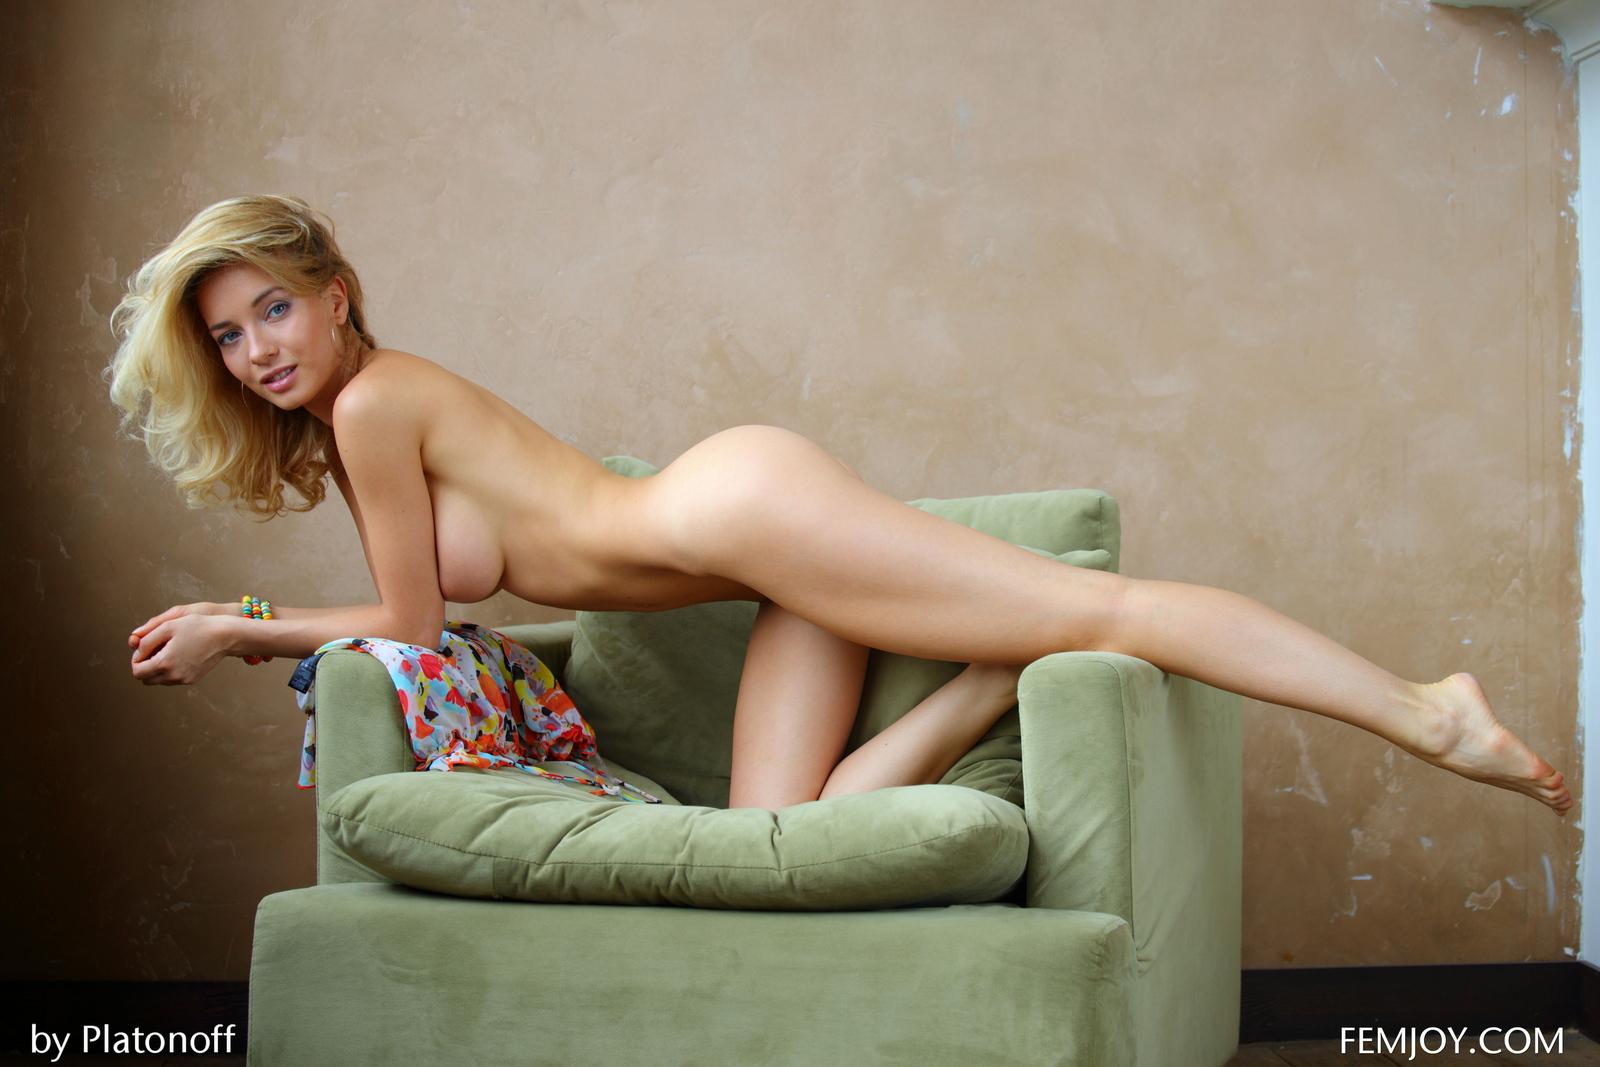 annabell-boobs-blonde-green-armchair-nude-femjoy-15